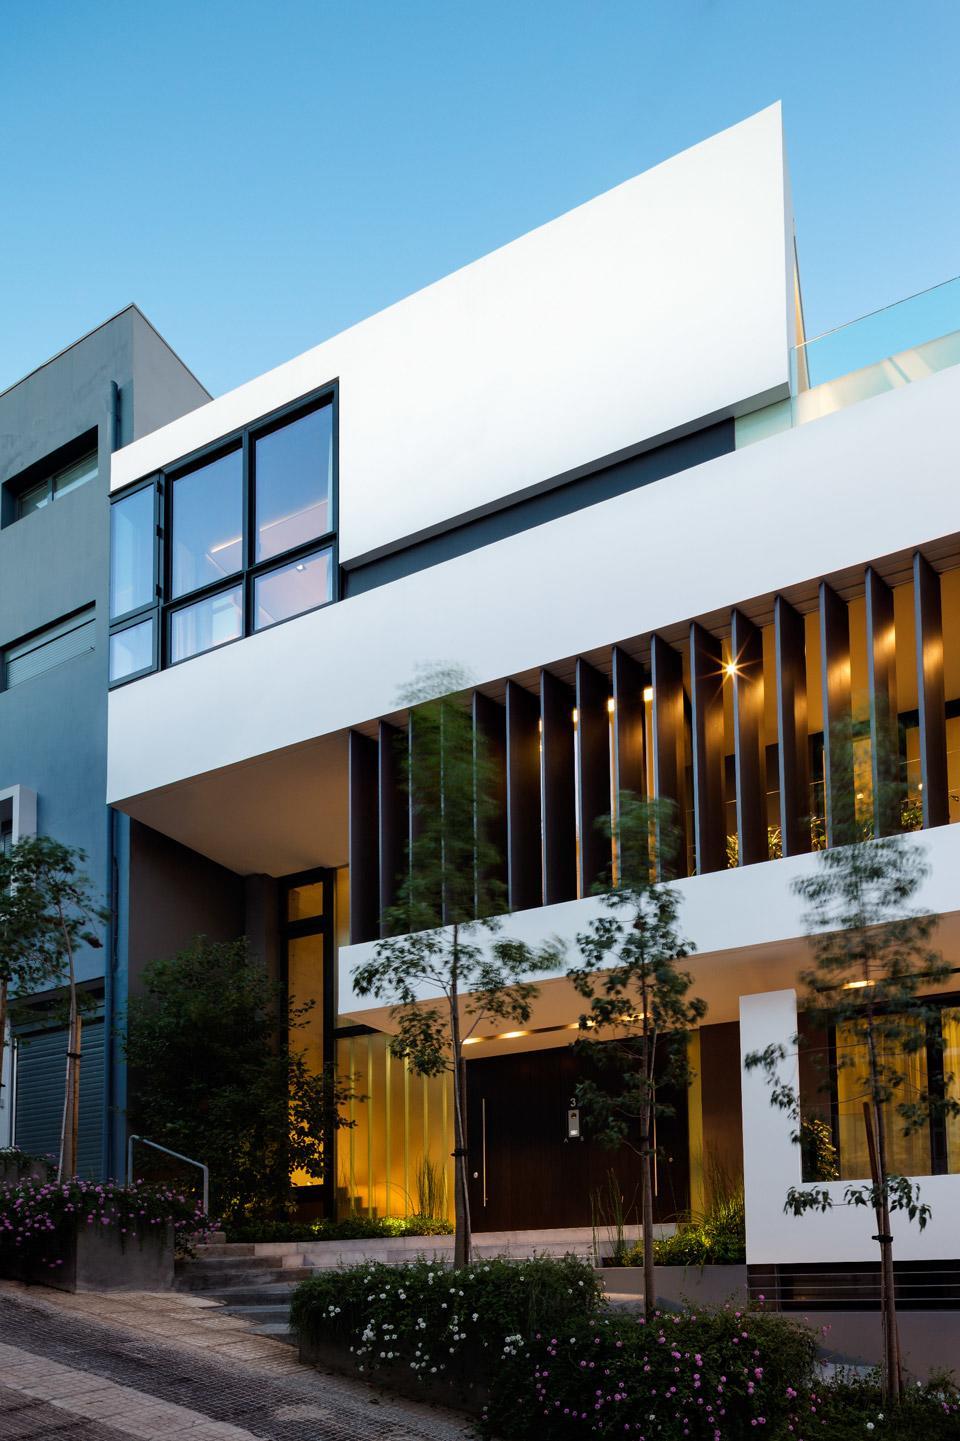 Sias-blog-ISV-Architects-Filopappou_5